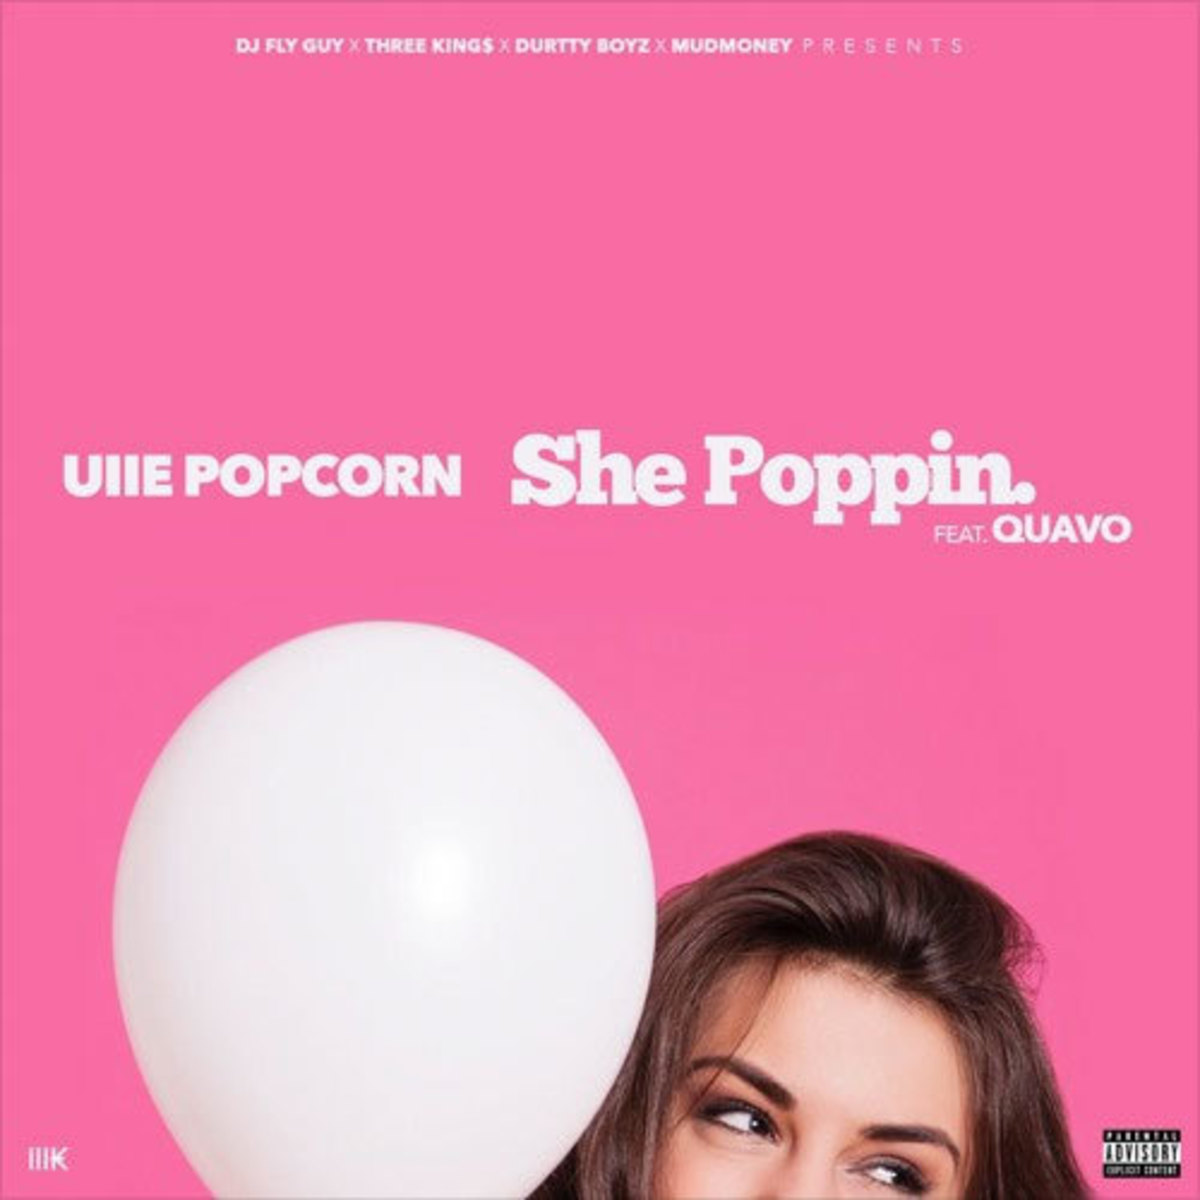 uiie-popcorn-poppin.jpg